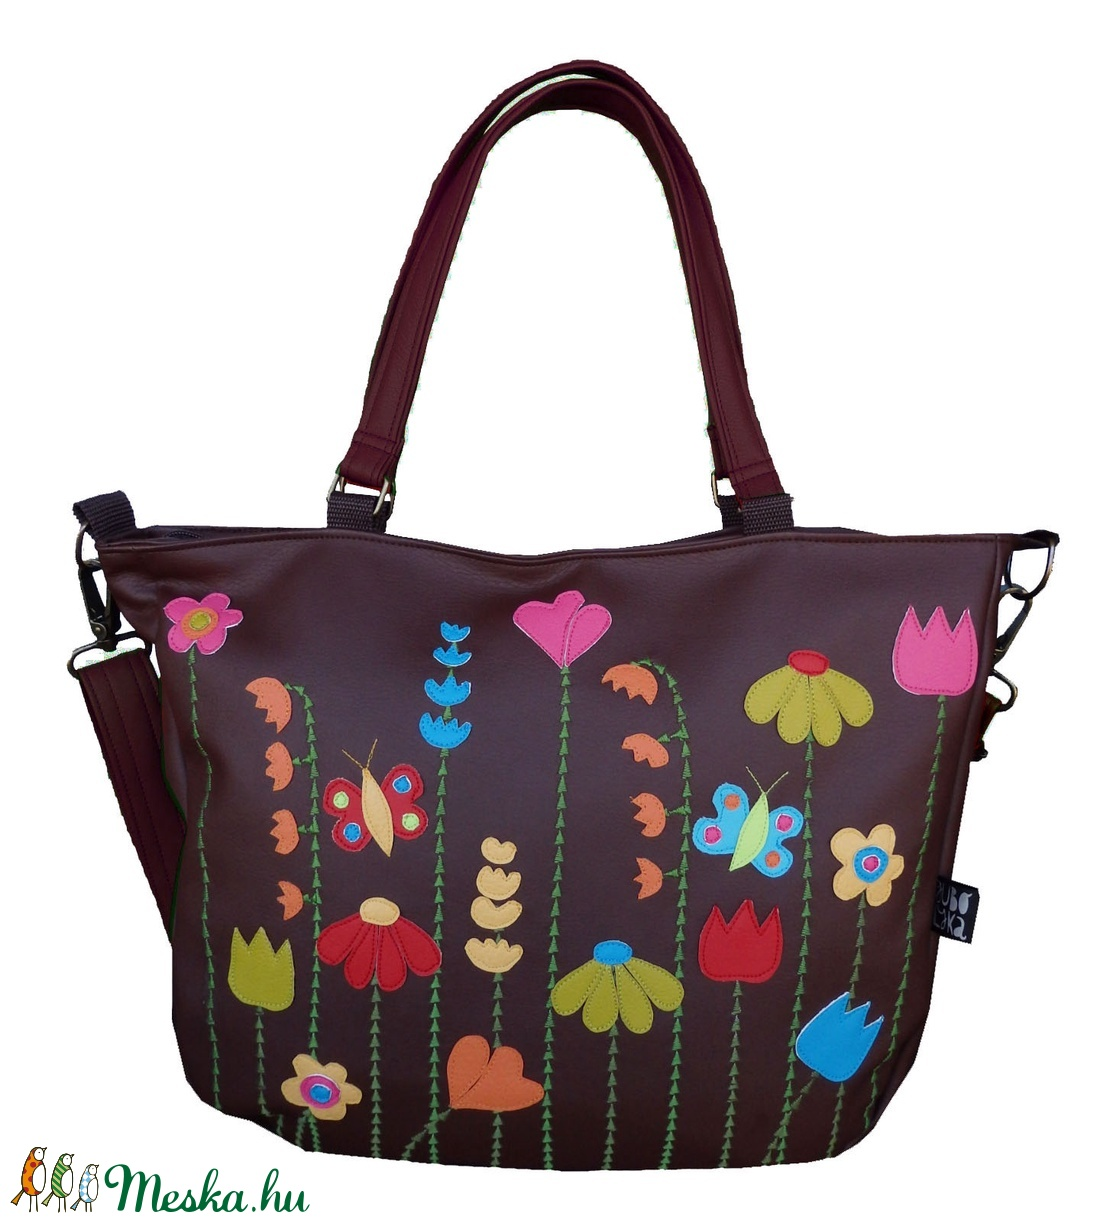 Virágos pakolós táska (gubolyka) - Meska.hu